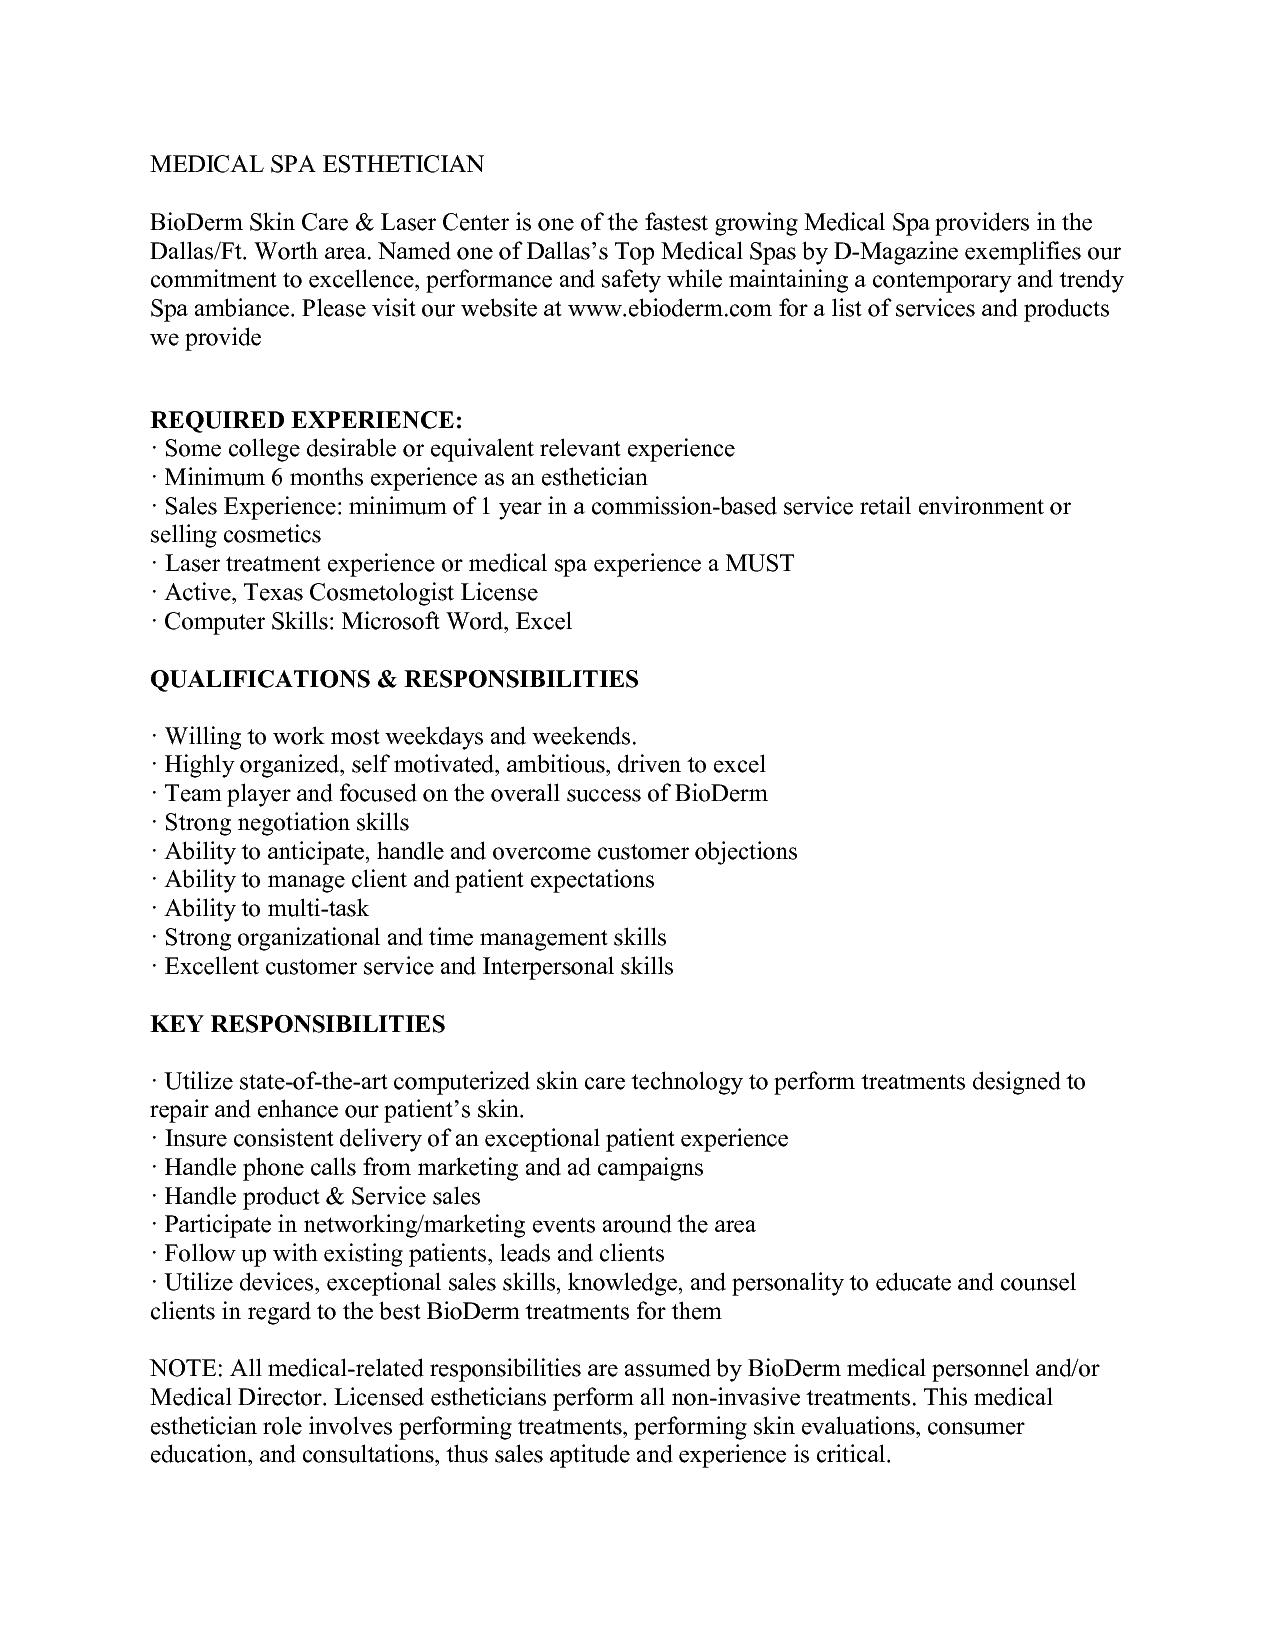 microsoft word esthetician resume template